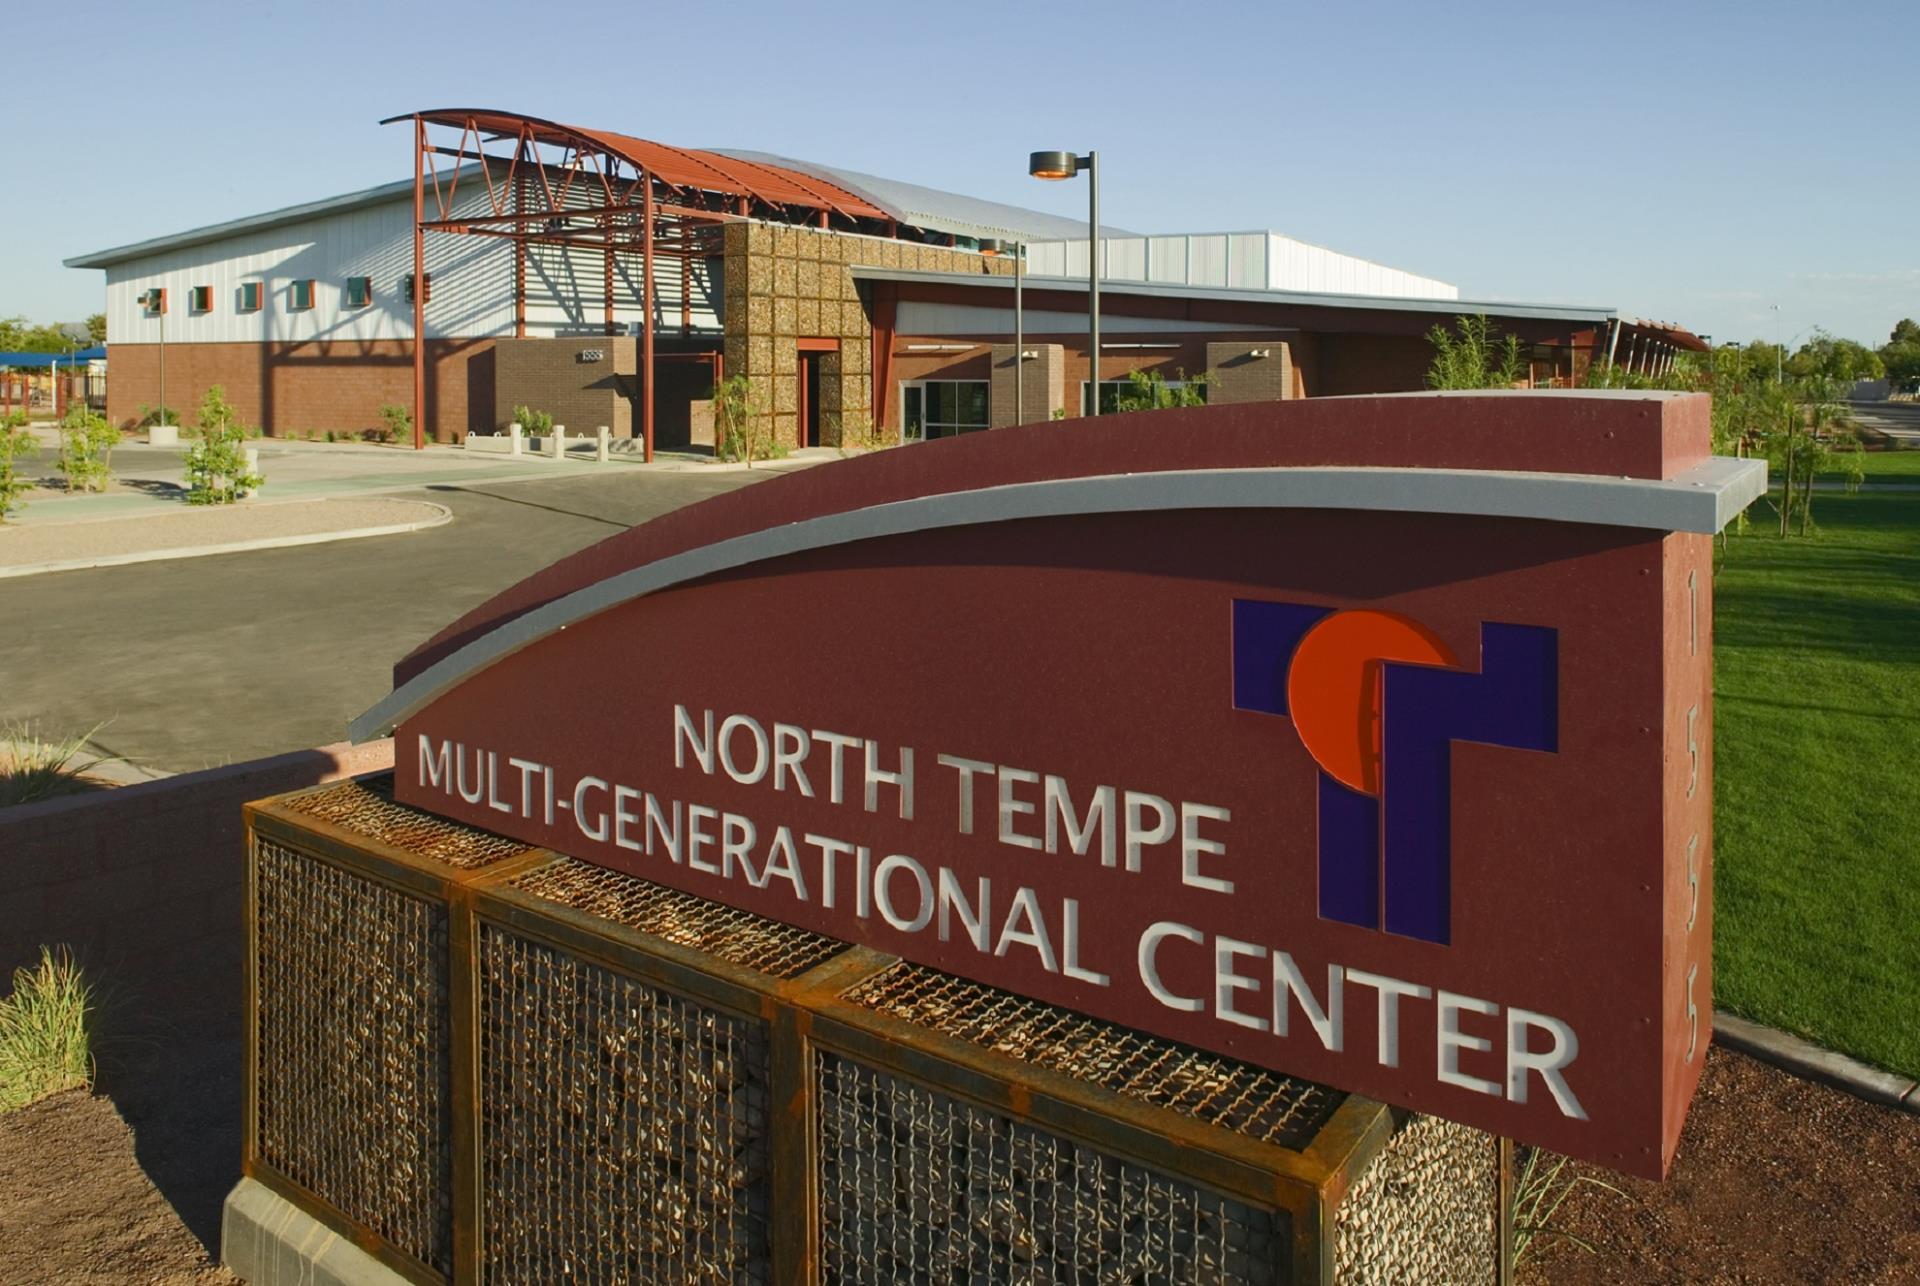 North Tempe Multi Generational Center City Of Tempe Az